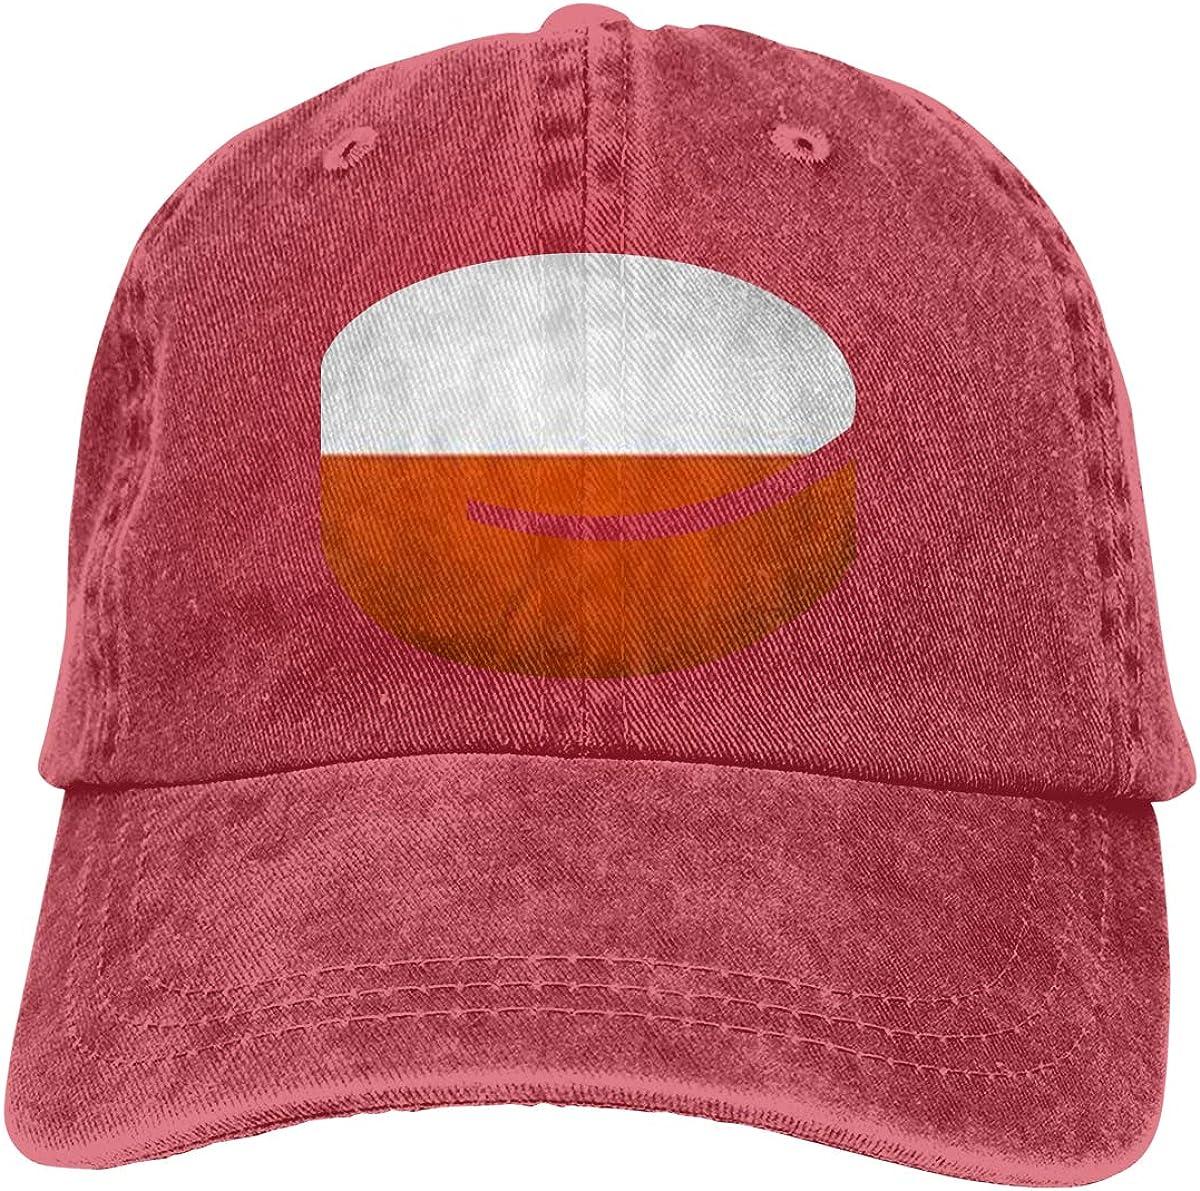 NOT Polen Flag Hockey Baseball Hat Adjustable Jeans Cap Dad Hat